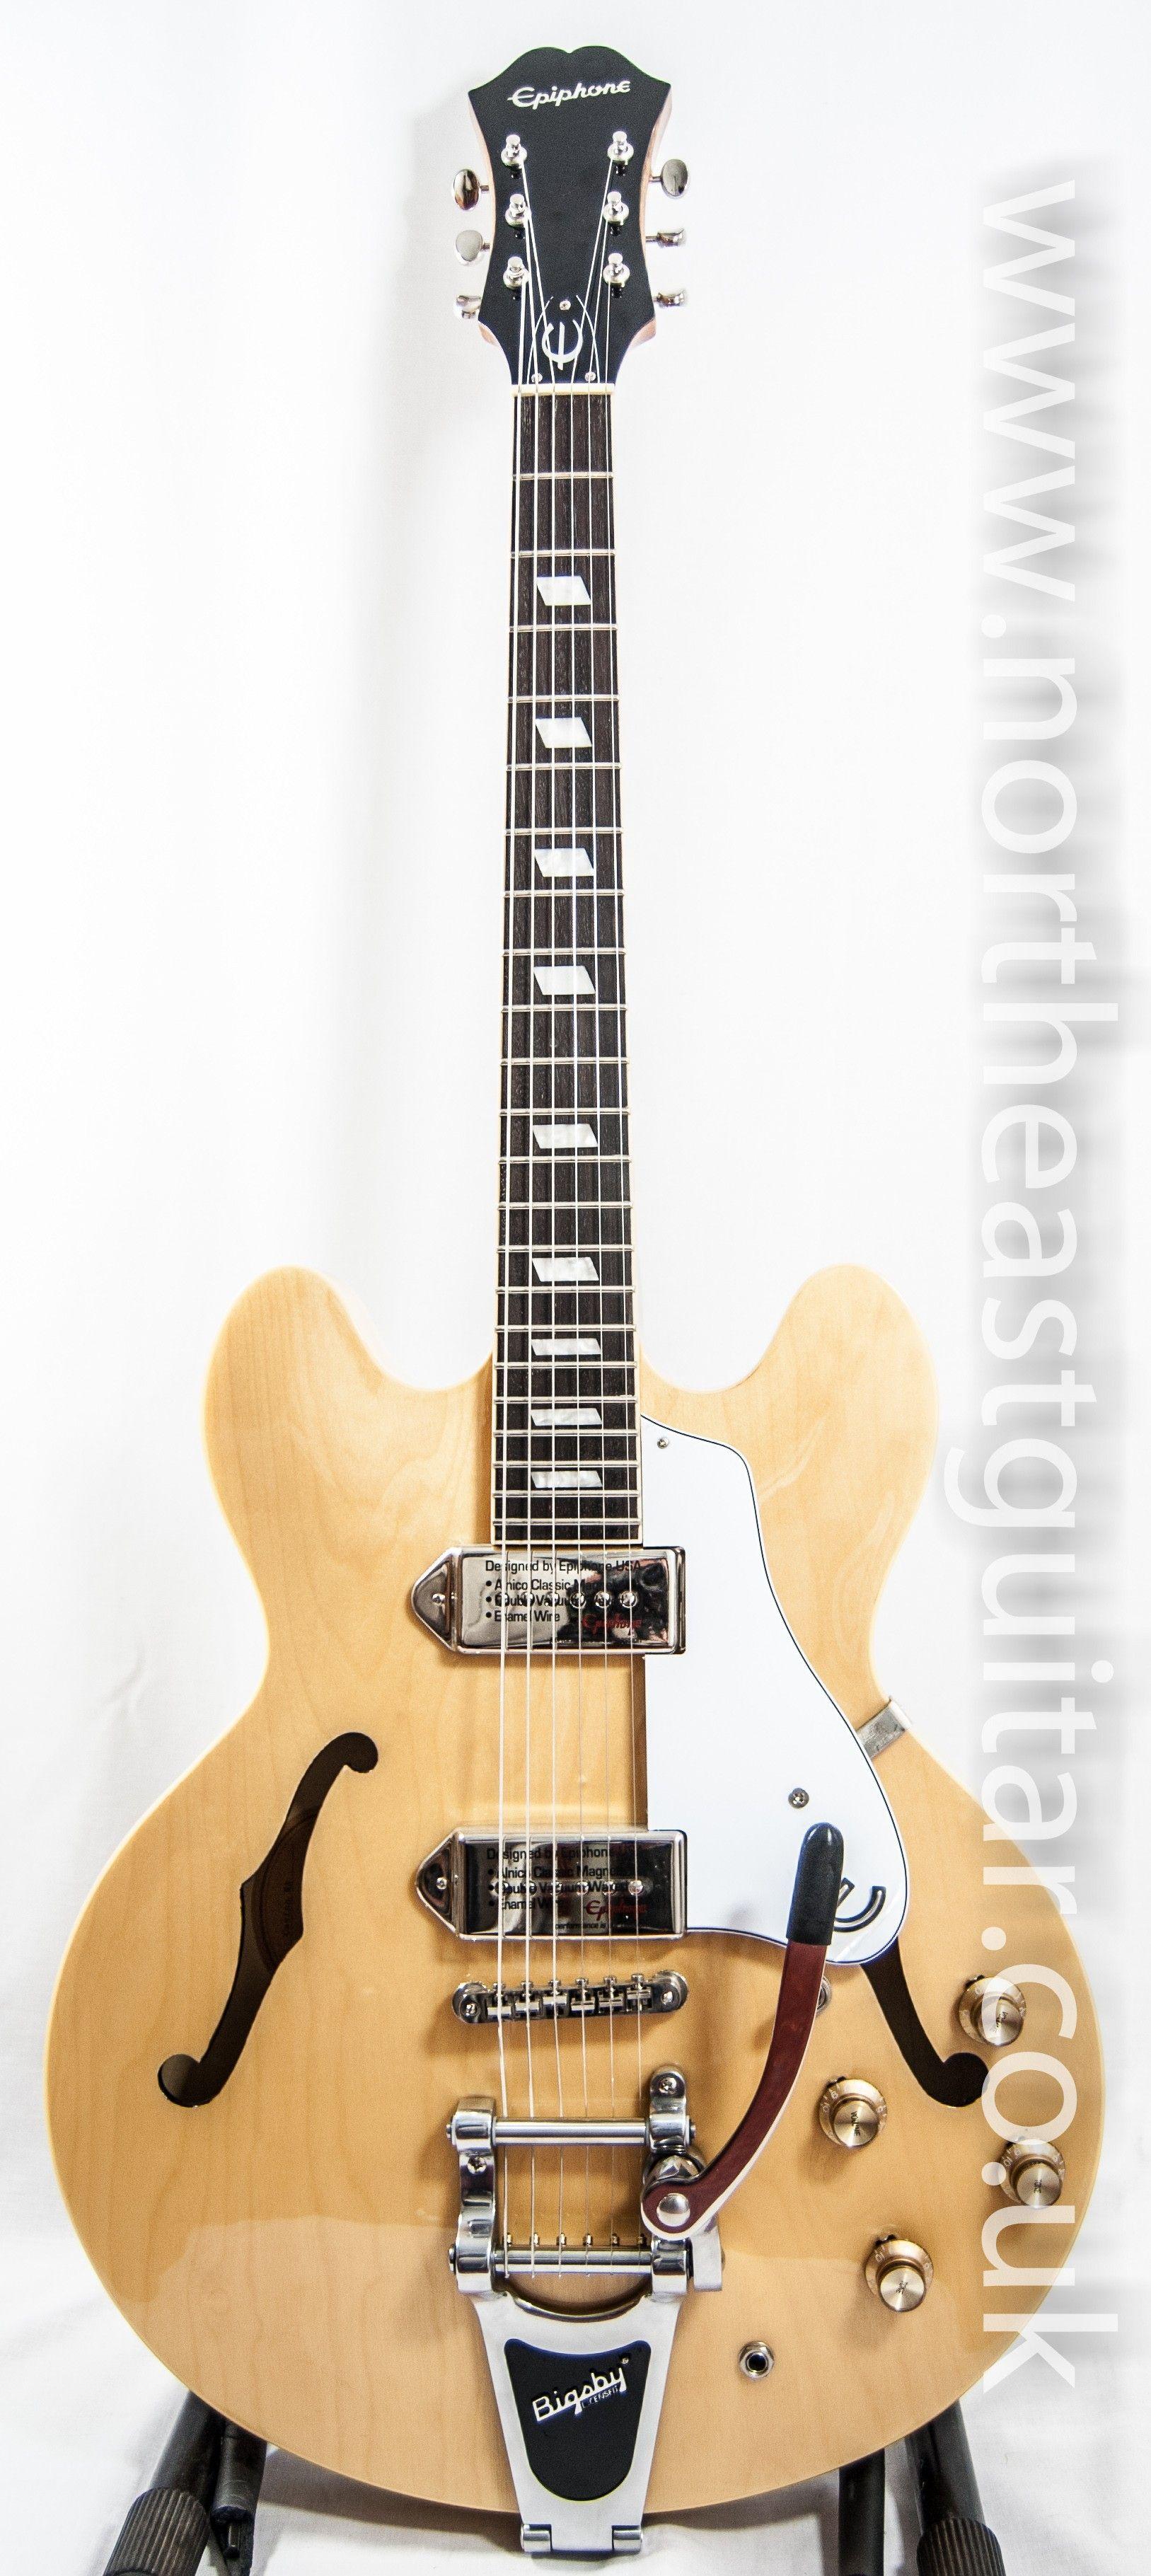 Epiphone Casino Bigsby Natural Epiphone Guitar Vintage Guitars